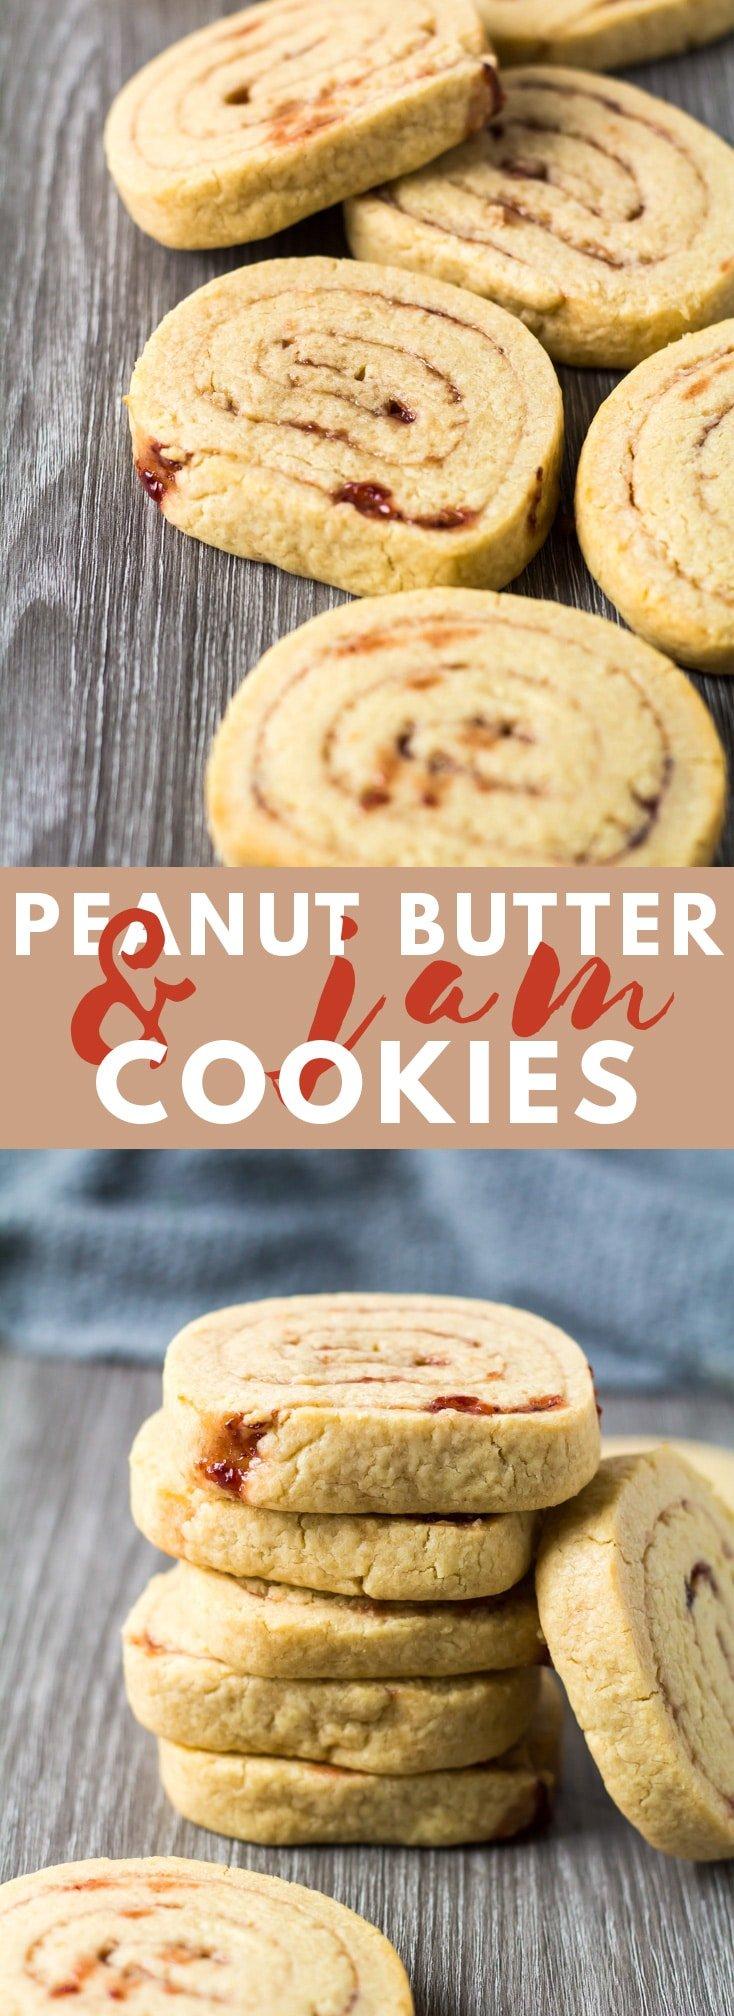 Peanut Butter & Jam Pinwheel Cookies